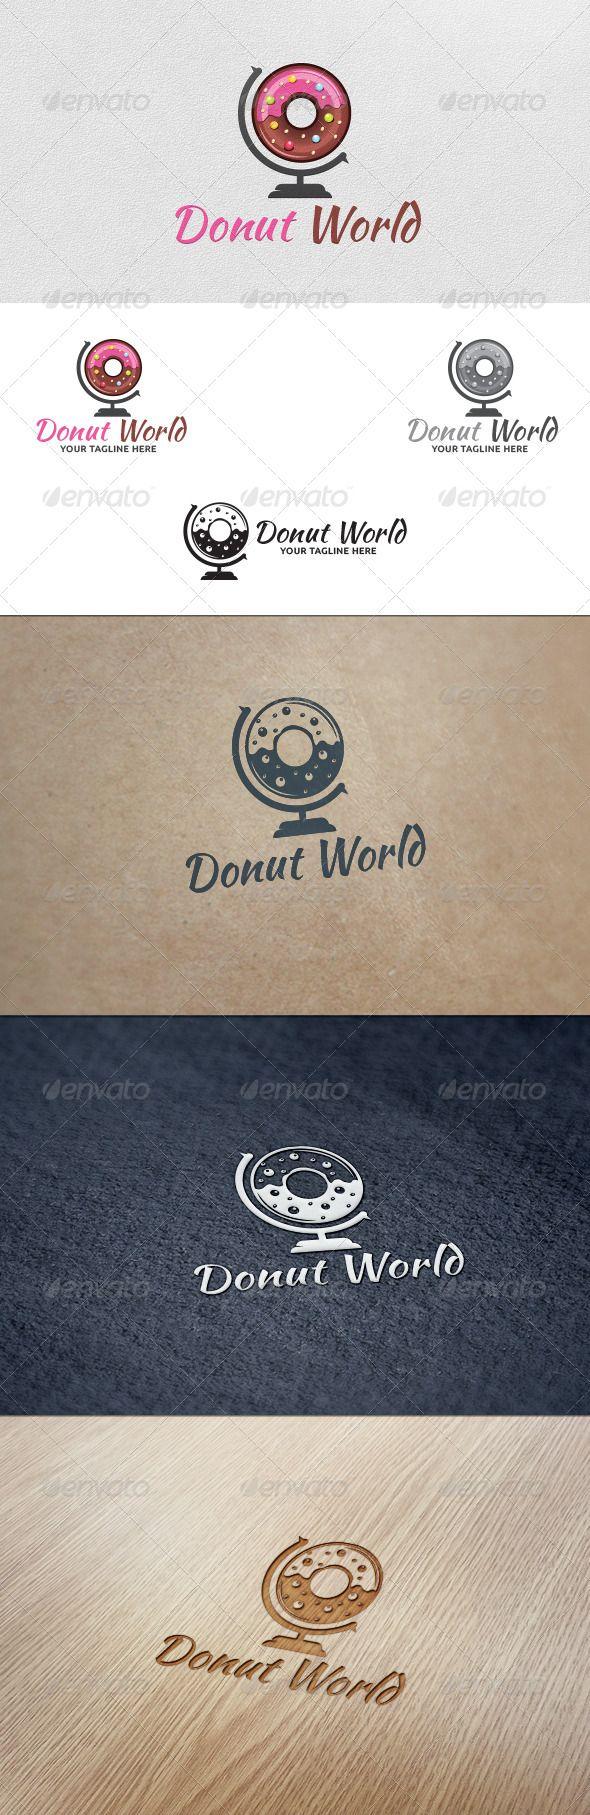 Donut World - Logo Template